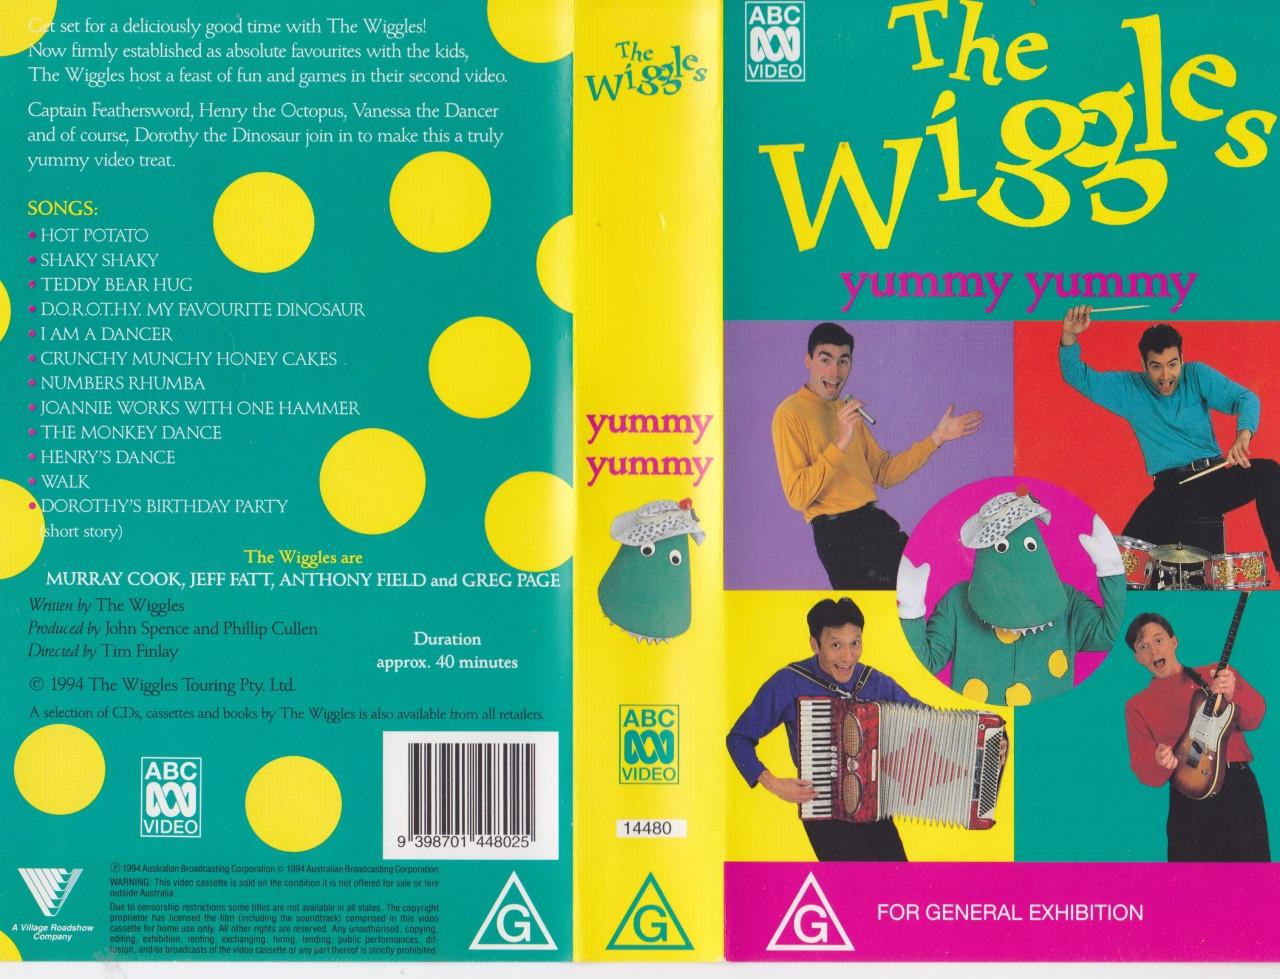 Wiggles Videos THE WIGGLES YUMMY YUMM...